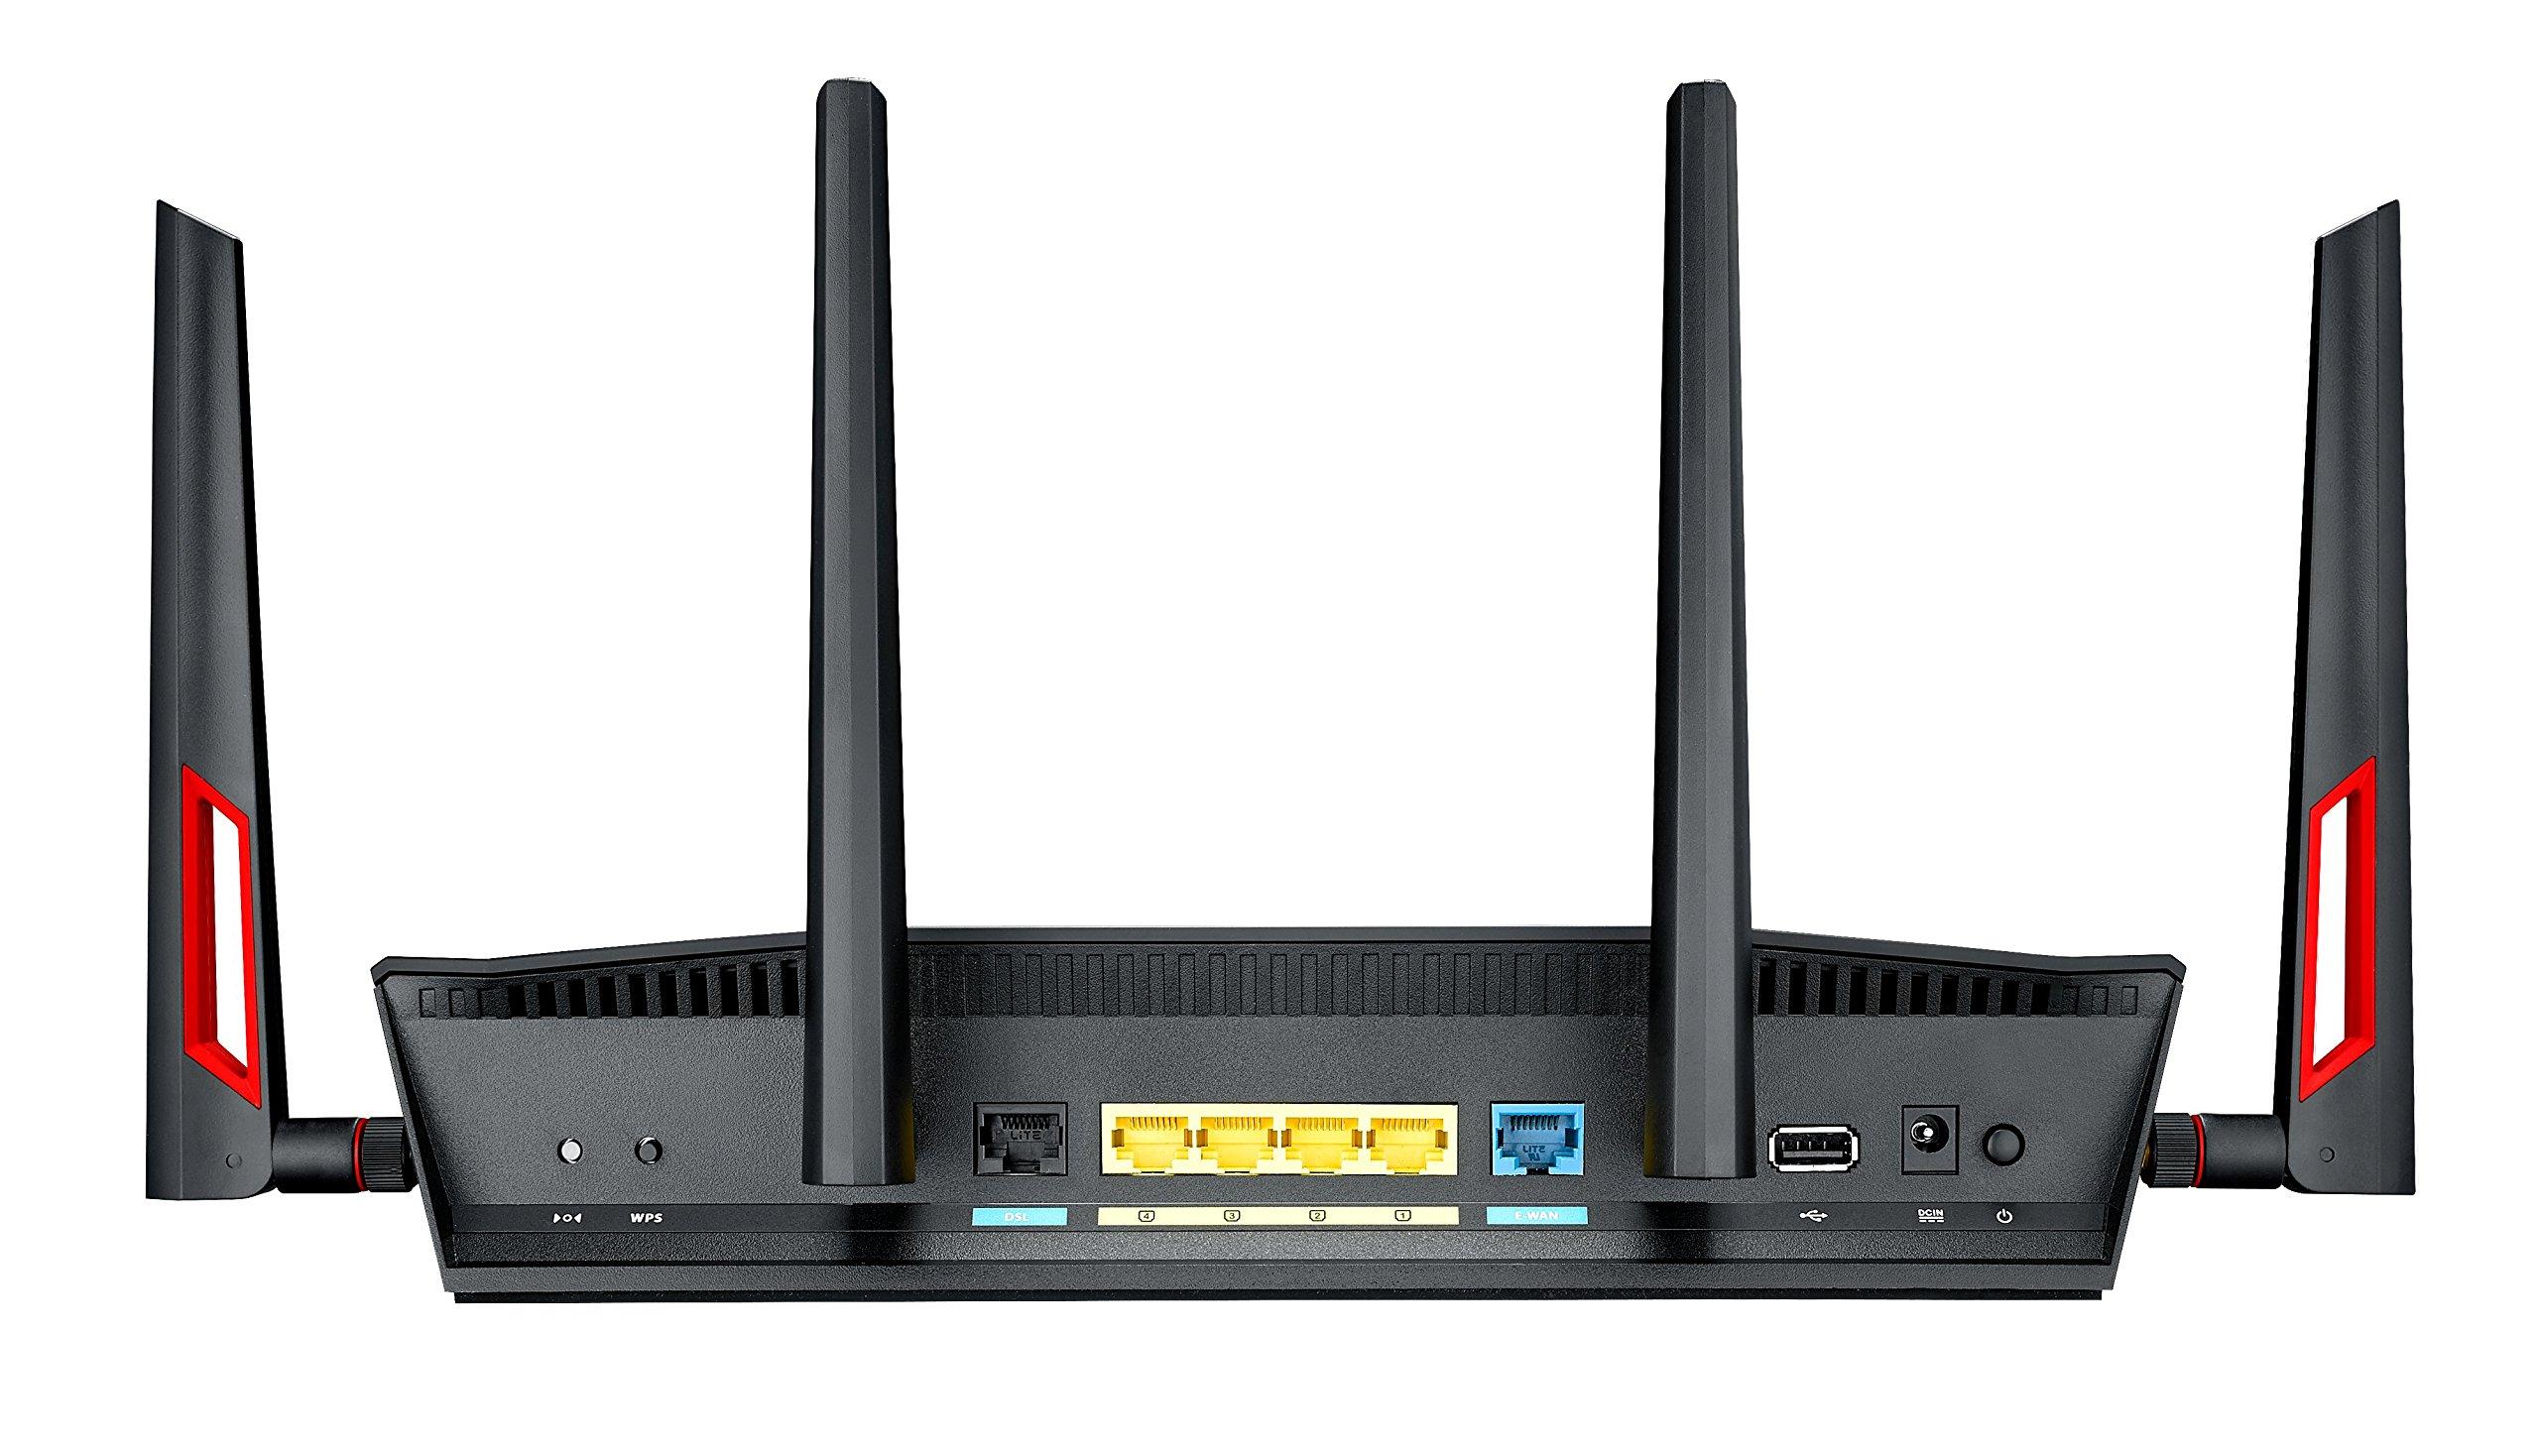 Asus DSL-AC88U Modem Router (EU-Version Annex A, WiFi 5 AC3100 MU-MIMO, 4x Gigabit LAN, AiProtection, Dual-Core CPU…